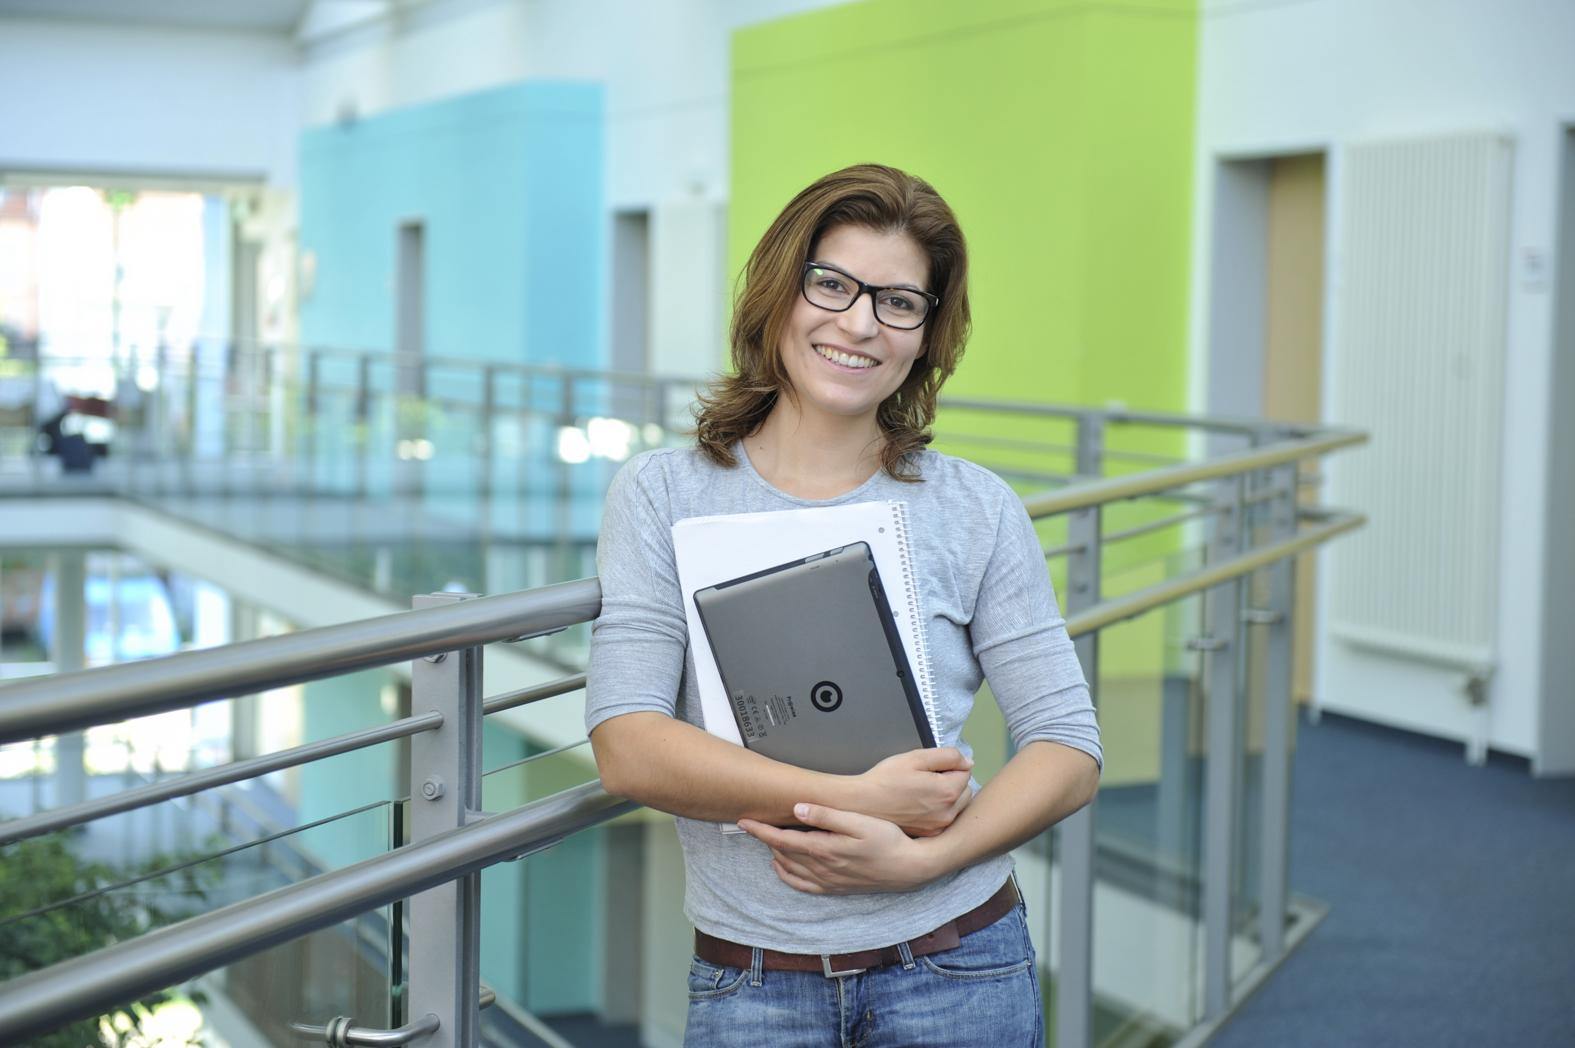 Digitale Revolution des Klassenzimmers – Mit AixConcept gelingt Sie an jeder Schule